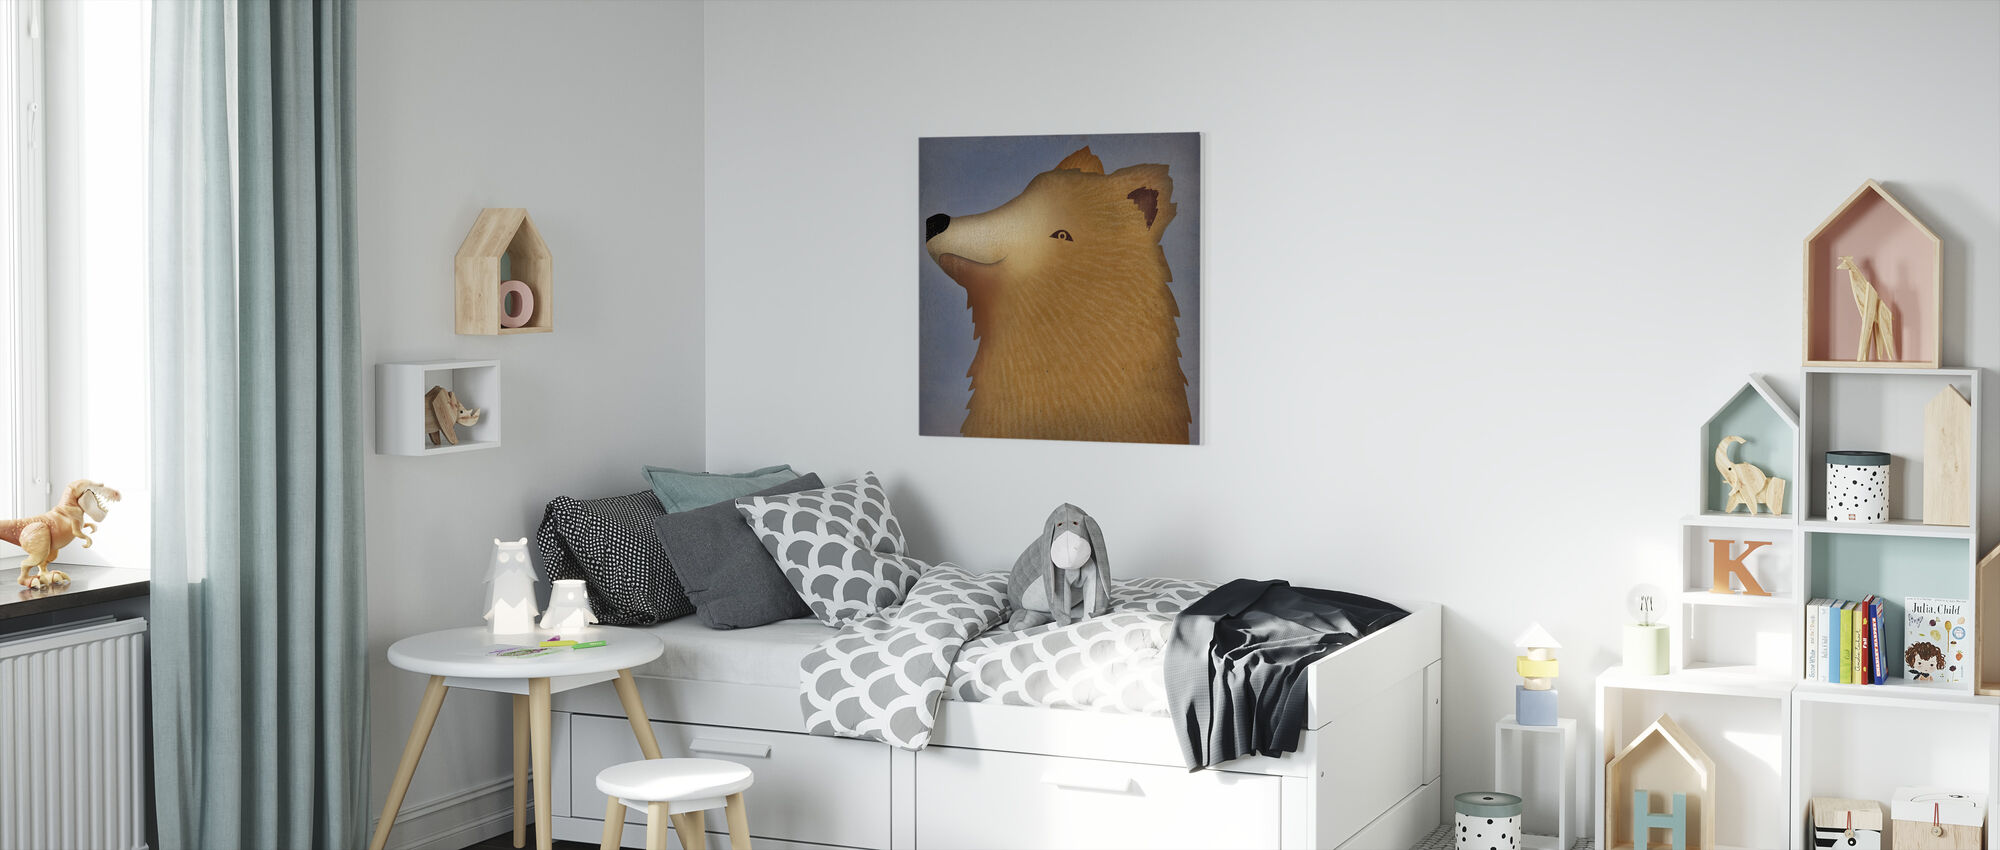 brunbjørn wow - Lerretsbilde - Barnerom